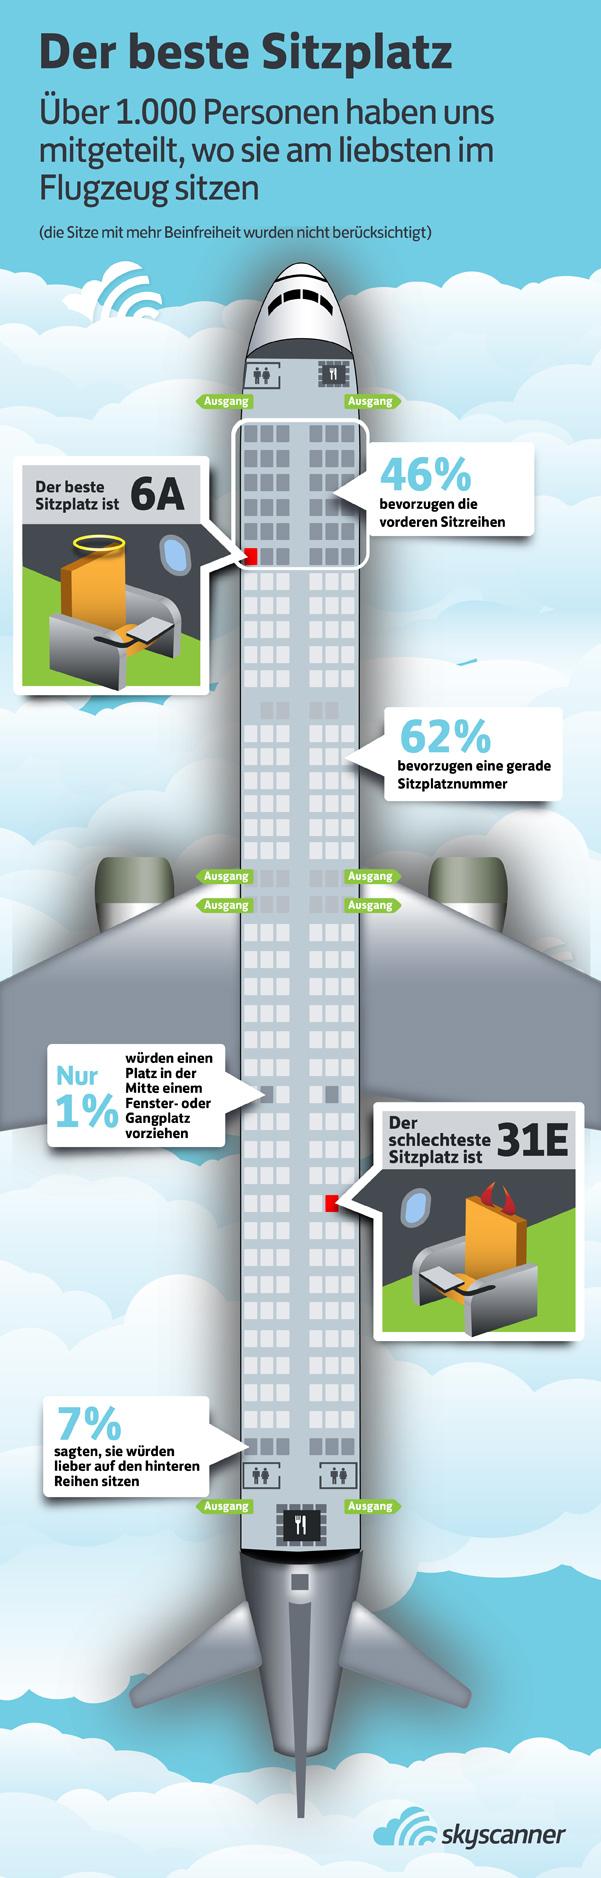 skyscanner umfrage enth llt der beste sitzplatz im. Black Bedroom Furniture Sets. Home Design Ideas